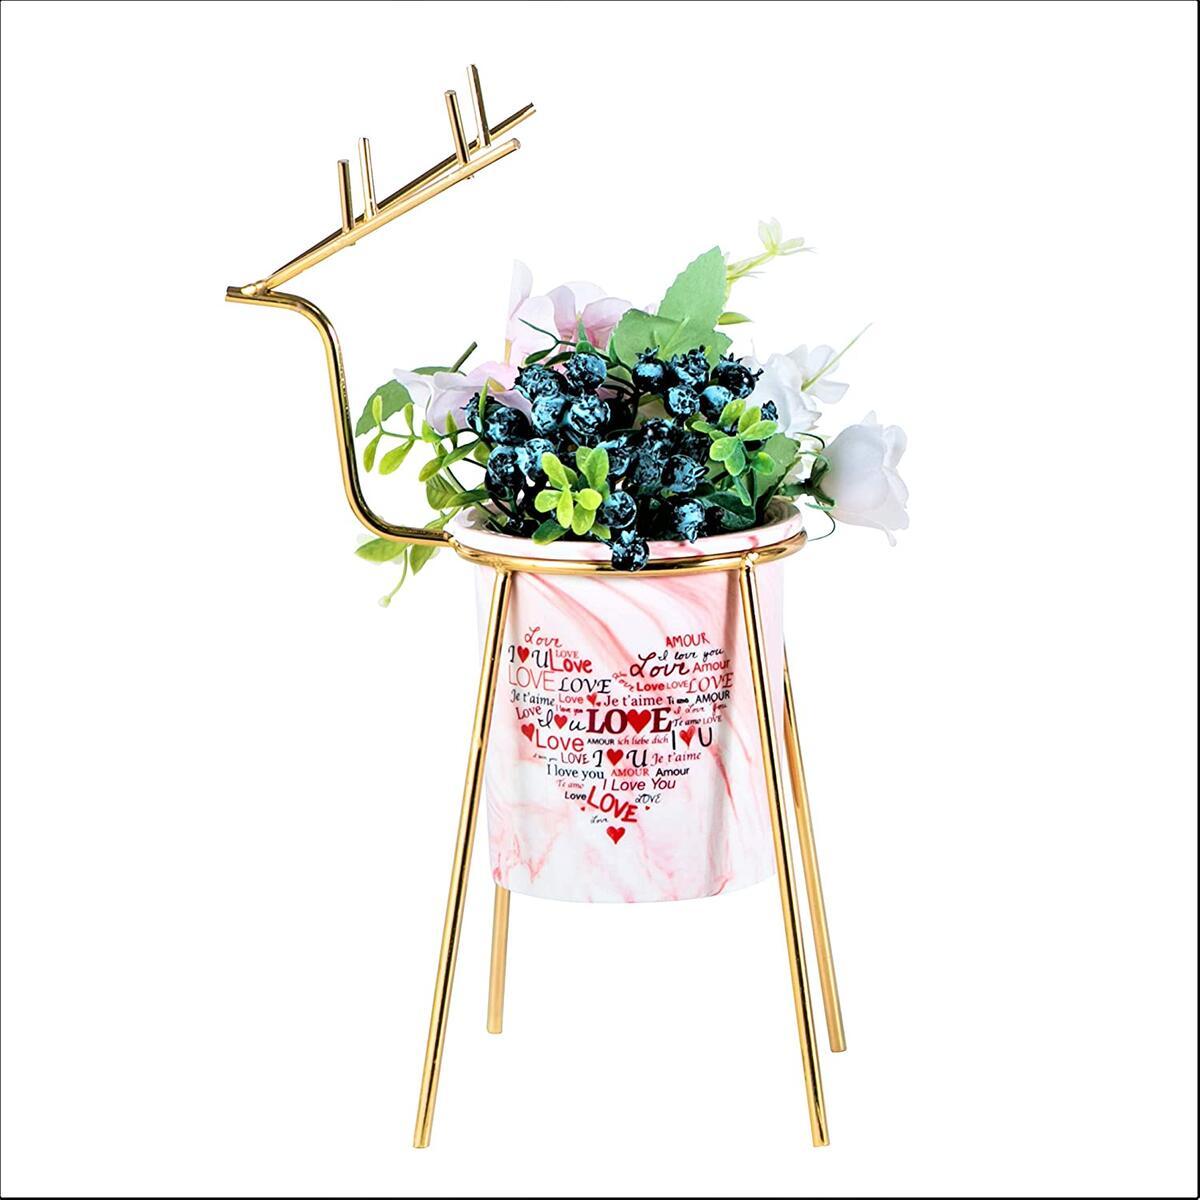 Succulent Planter - 3.8 Inch, Pink Mini Plant Pot with Stand, Small Decorative Cute Succulent Pot, Modern Bathroom Bedroom Decor, Christmas Dining Table Centerpiece, Macetas para Plantas Decorativas